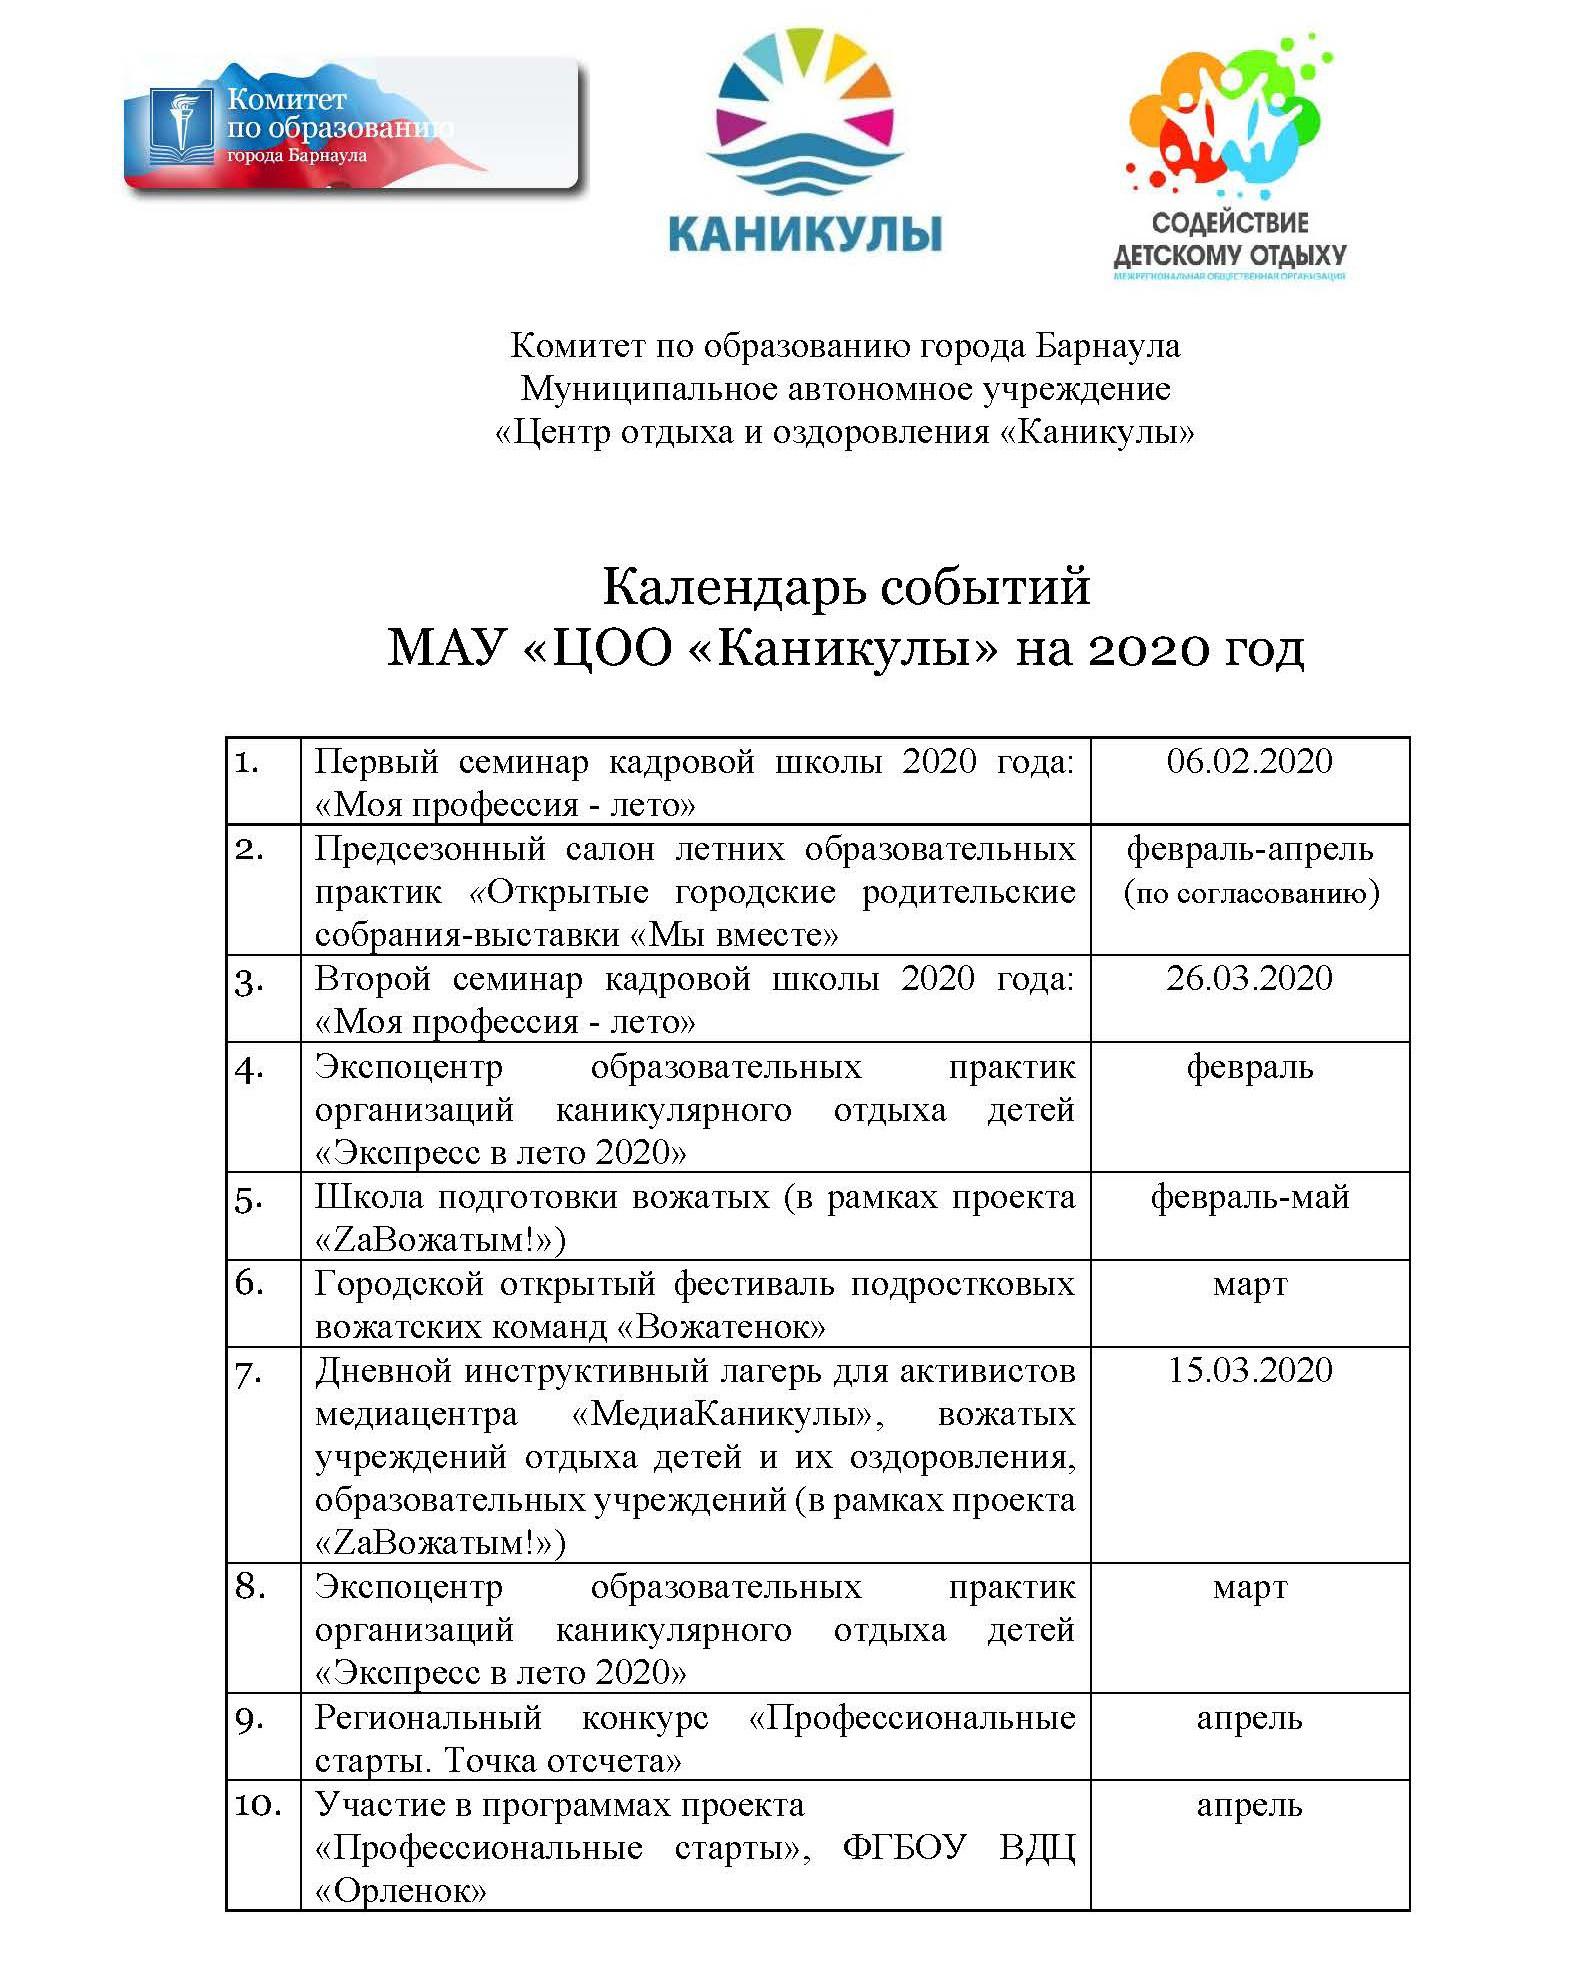 kalendar_sobytiy_MAU_TsOO_Kanikuly_2020_Страница_1